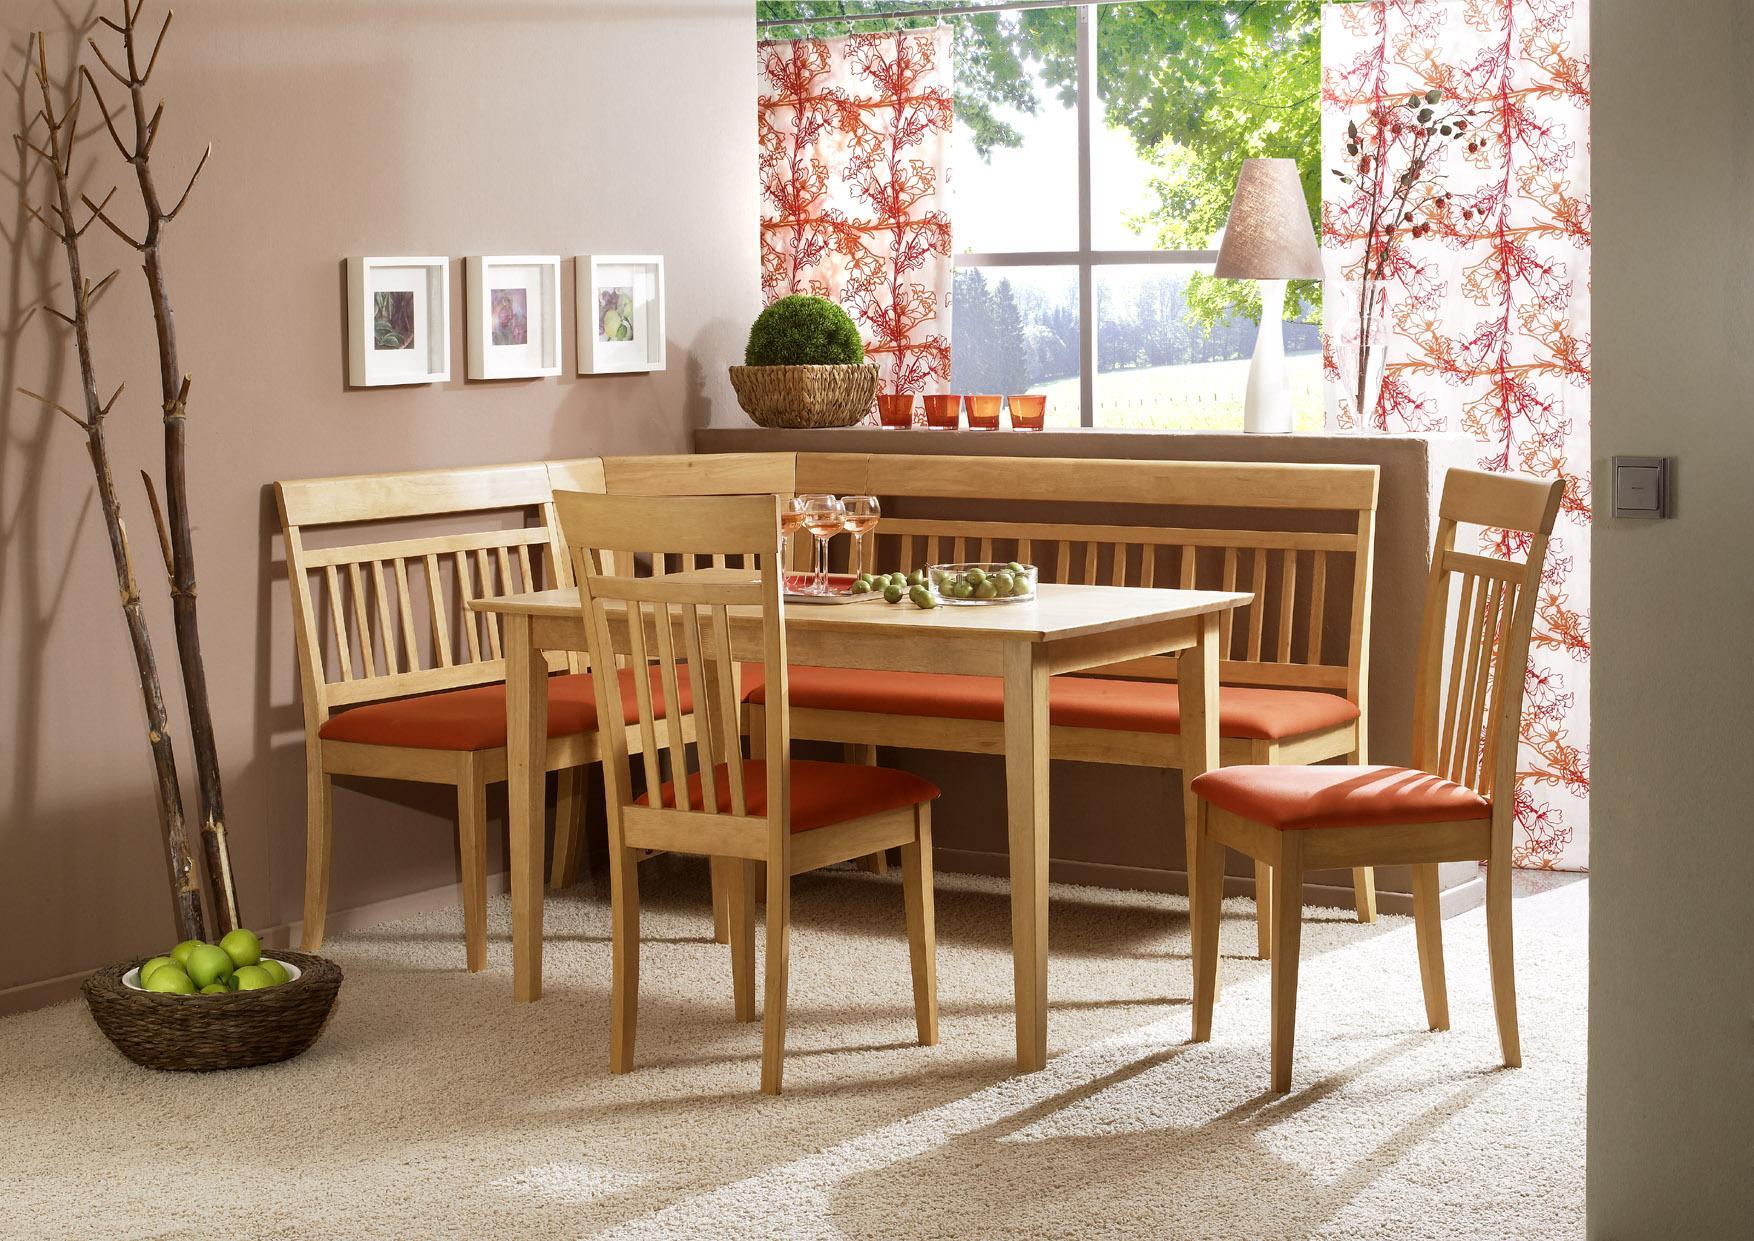 Exotic Woodn Corner Breakfast Nook Furniture Idea With Orange Bolster  Beneath Glass Window And Brown Wall